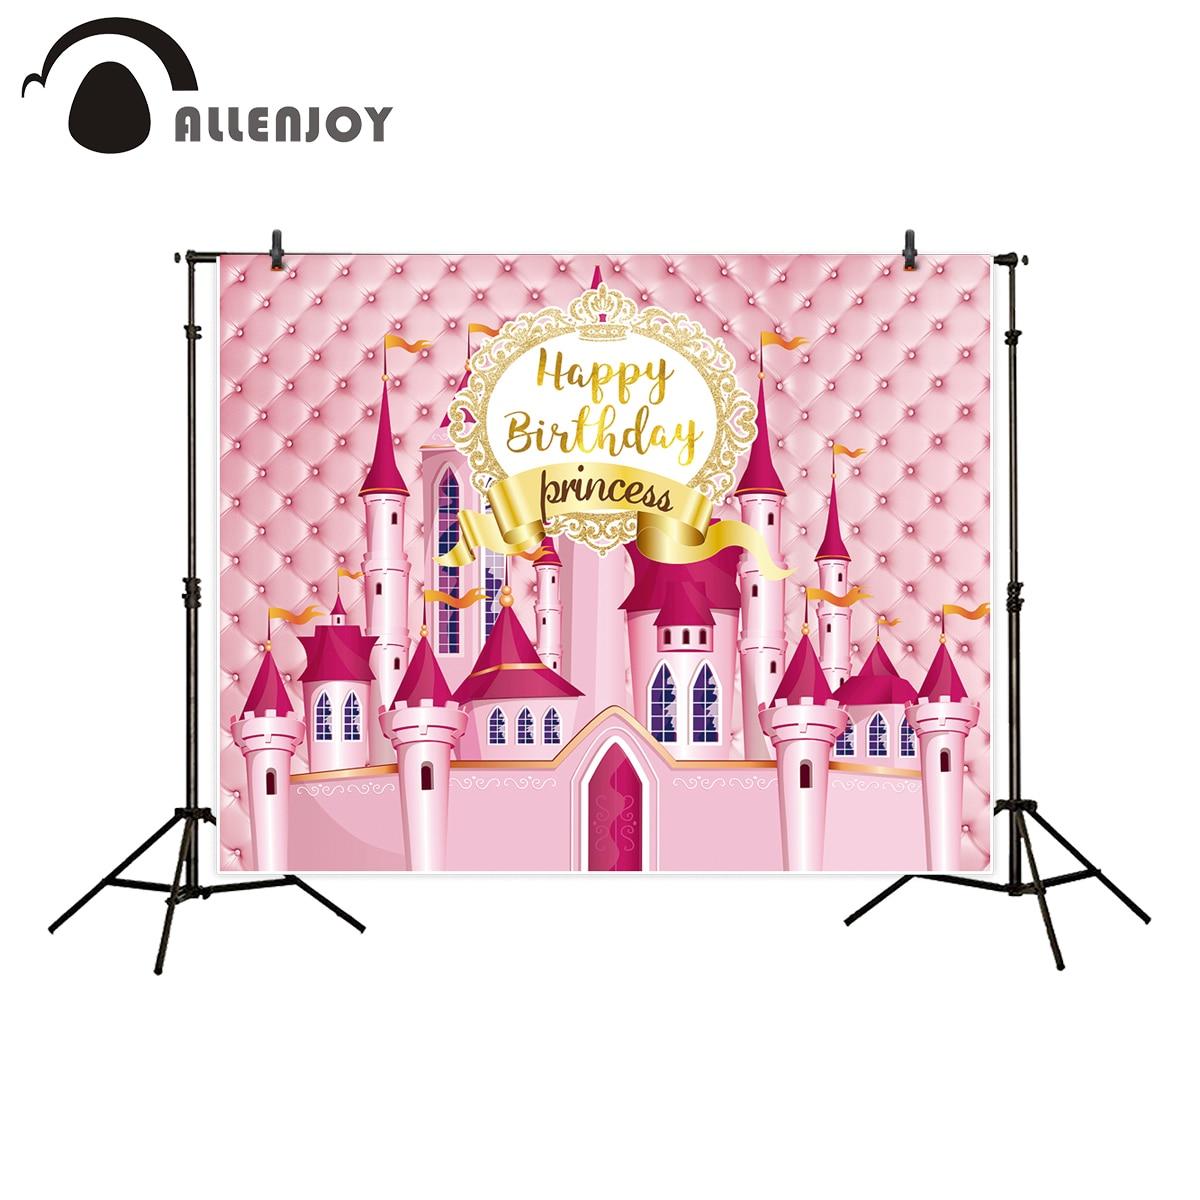 Allenjoy photography backdrop Princess pink castle headboard happy birthday children's photographic backgrounds photocall studio